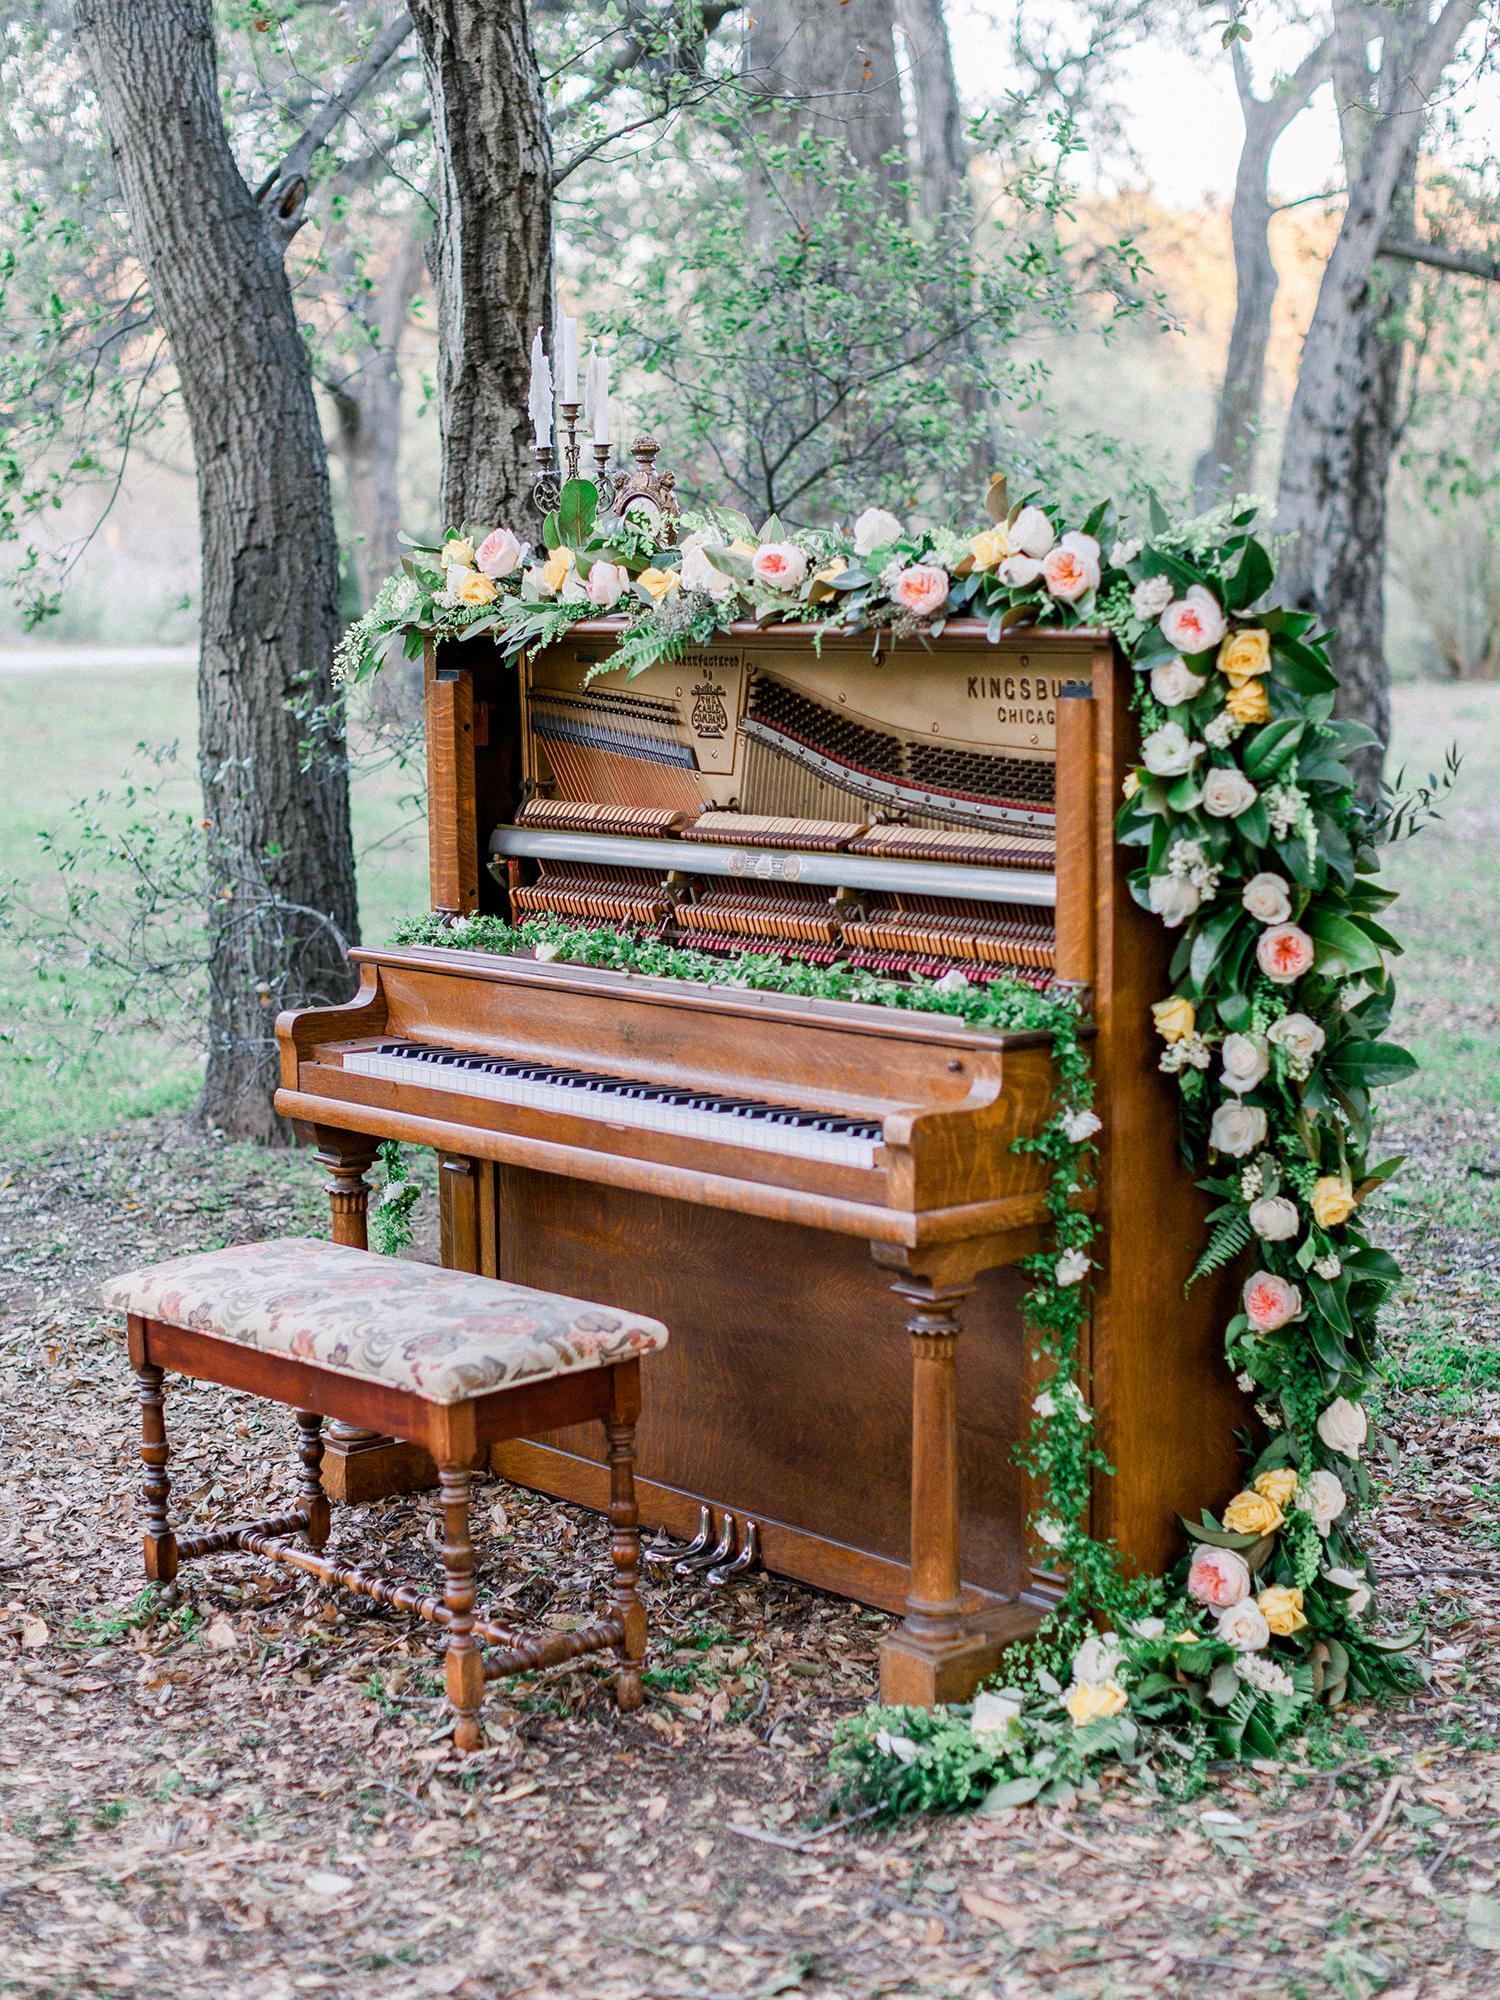 Outdoor Piano Wedding Decor